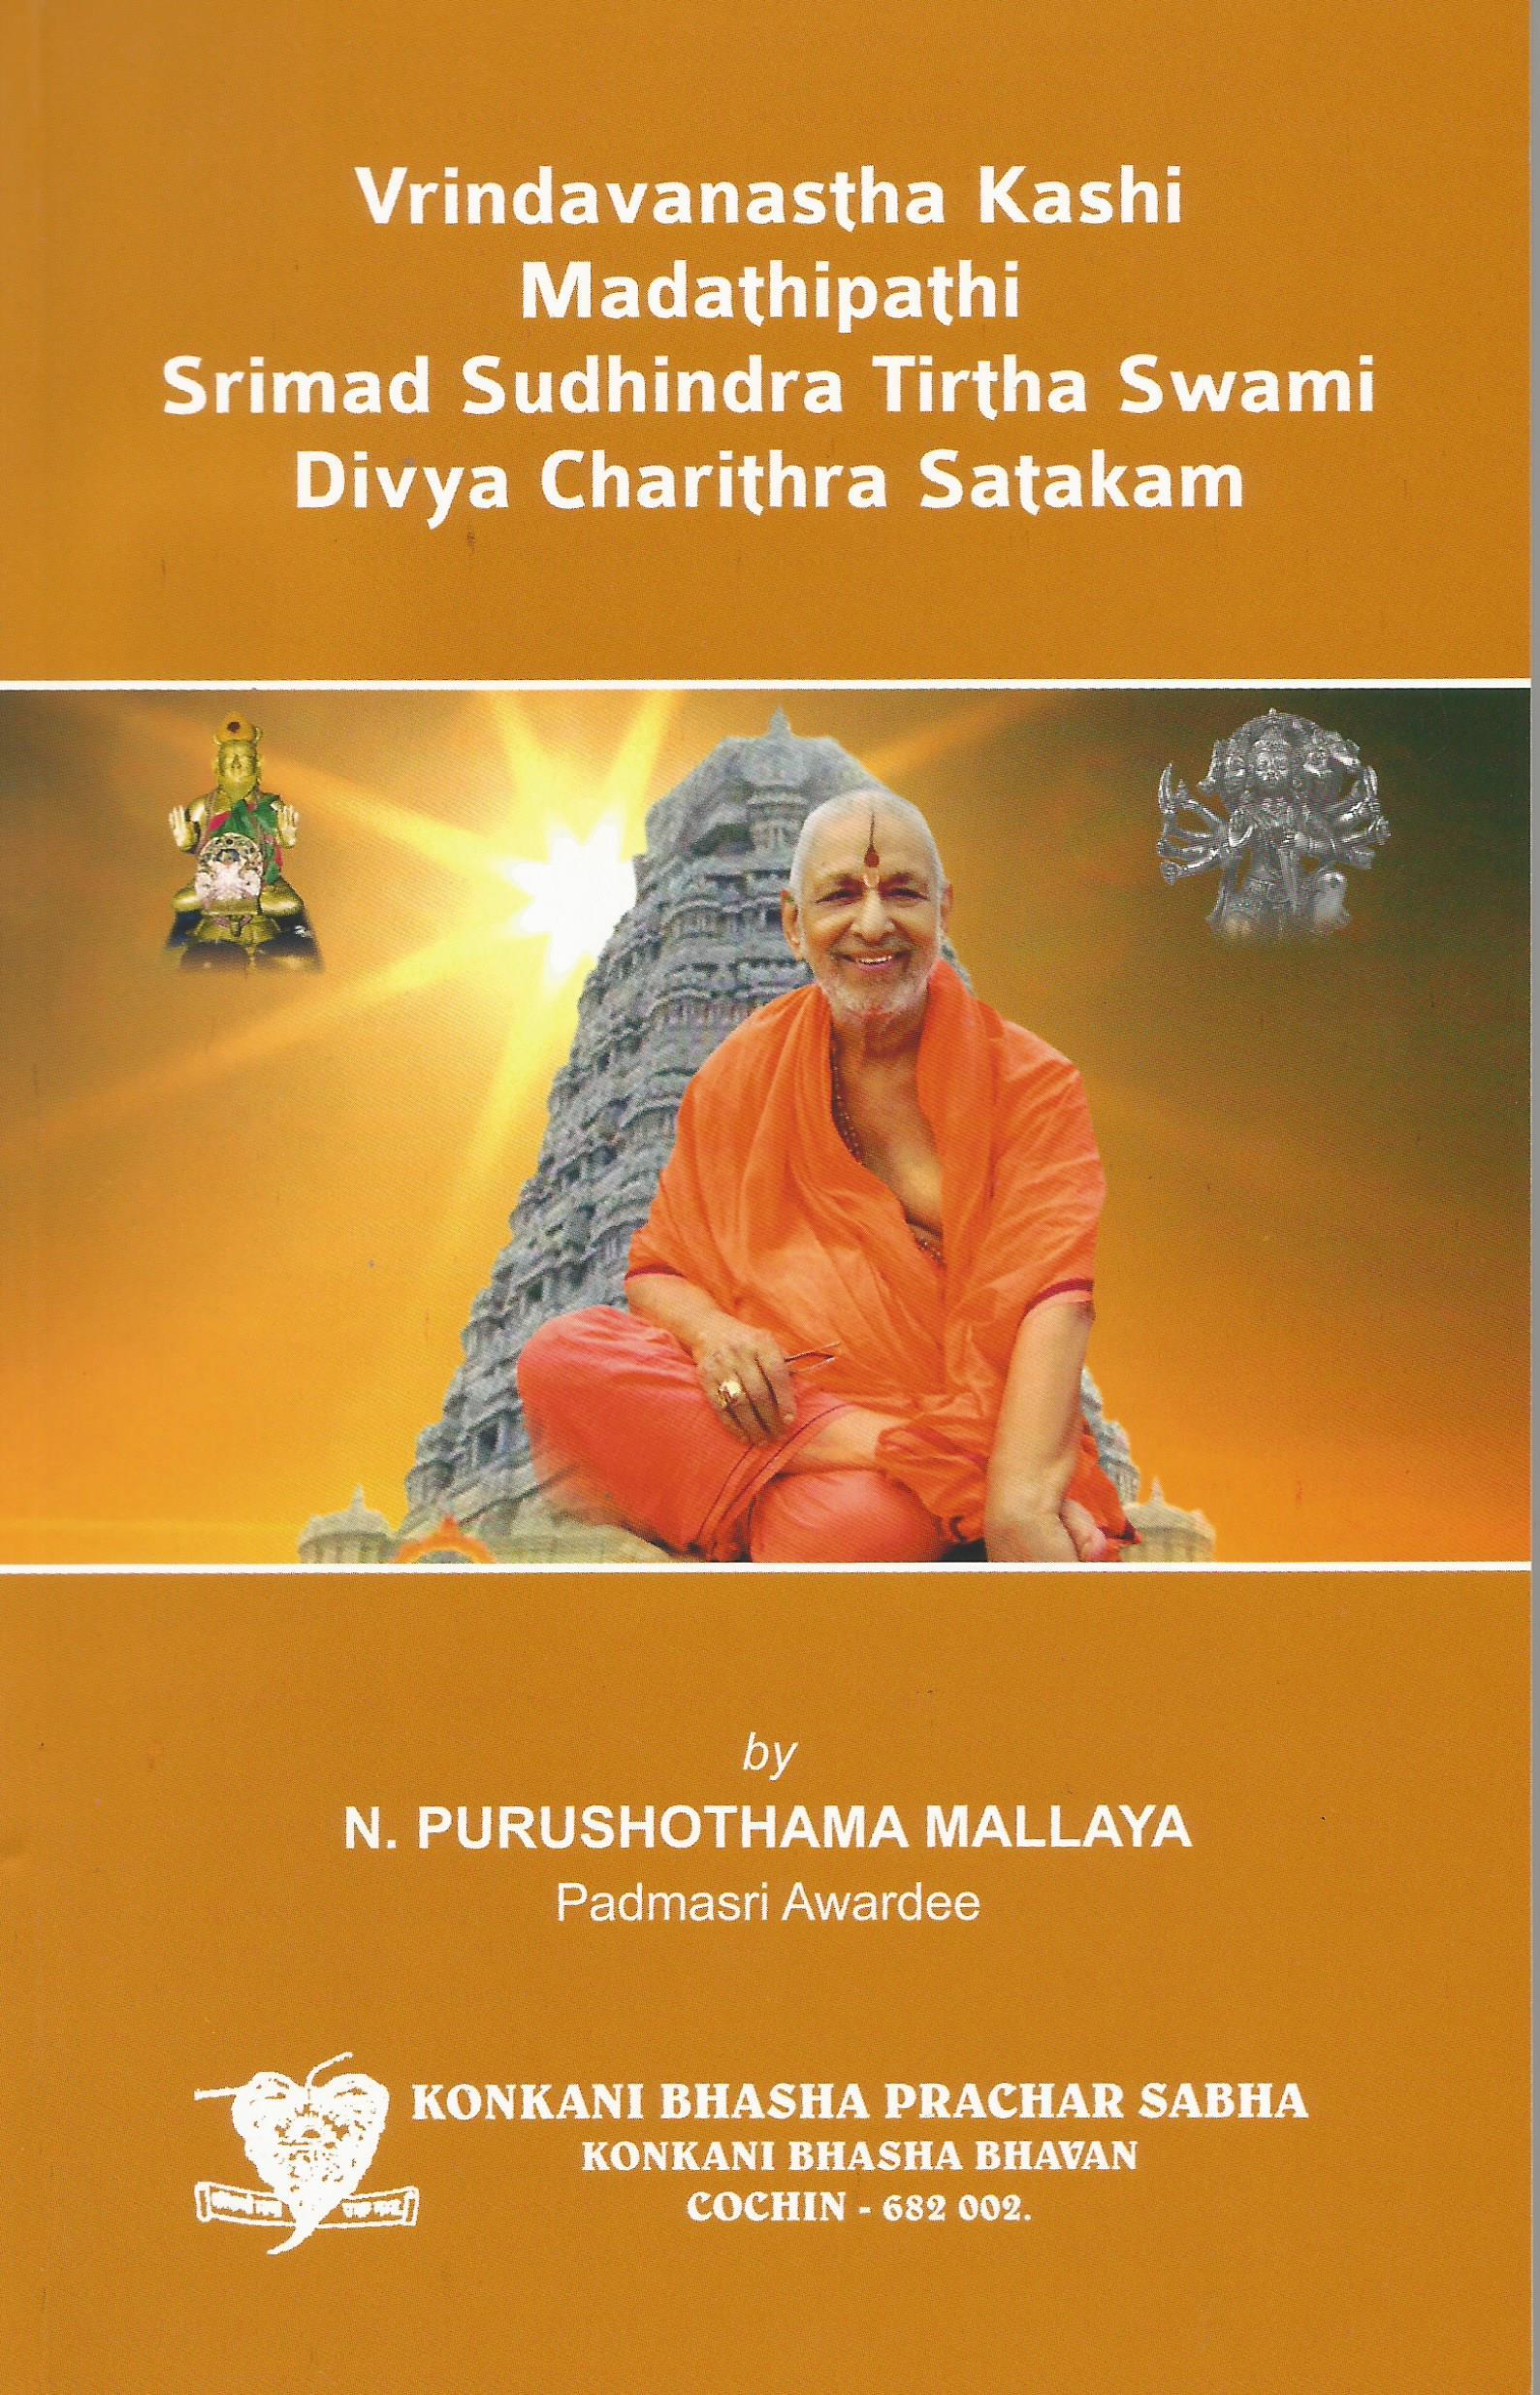 Vrindavanastha Kashi Madathipathi Srimad Sudhindra Tirtha Swami Divya Charithra Satakam